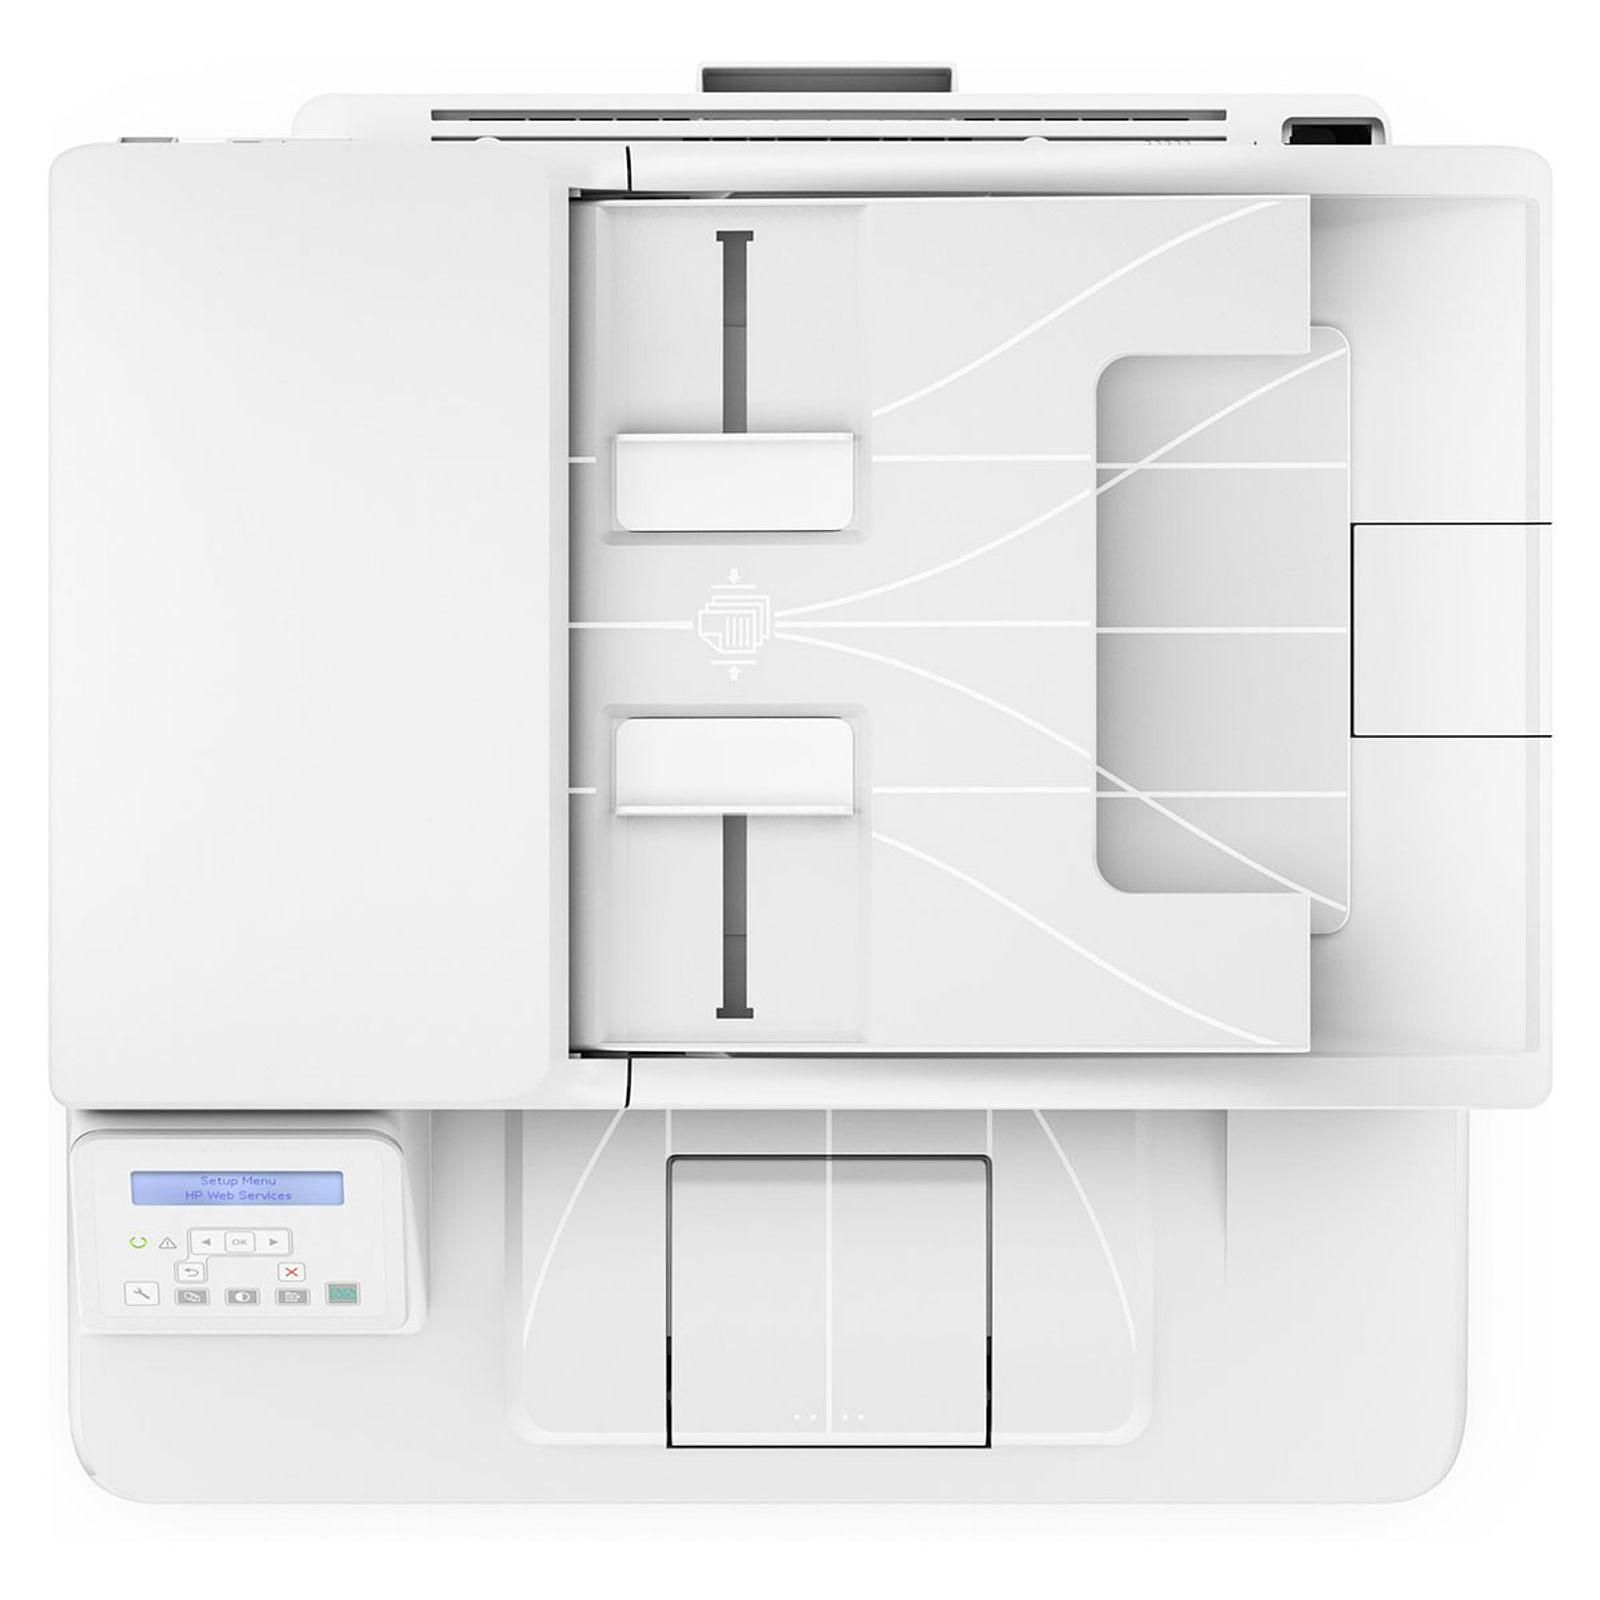 Imprimante multifonction HP LaserJet Pro MFP M227sdn - Cybertek.fr - 2